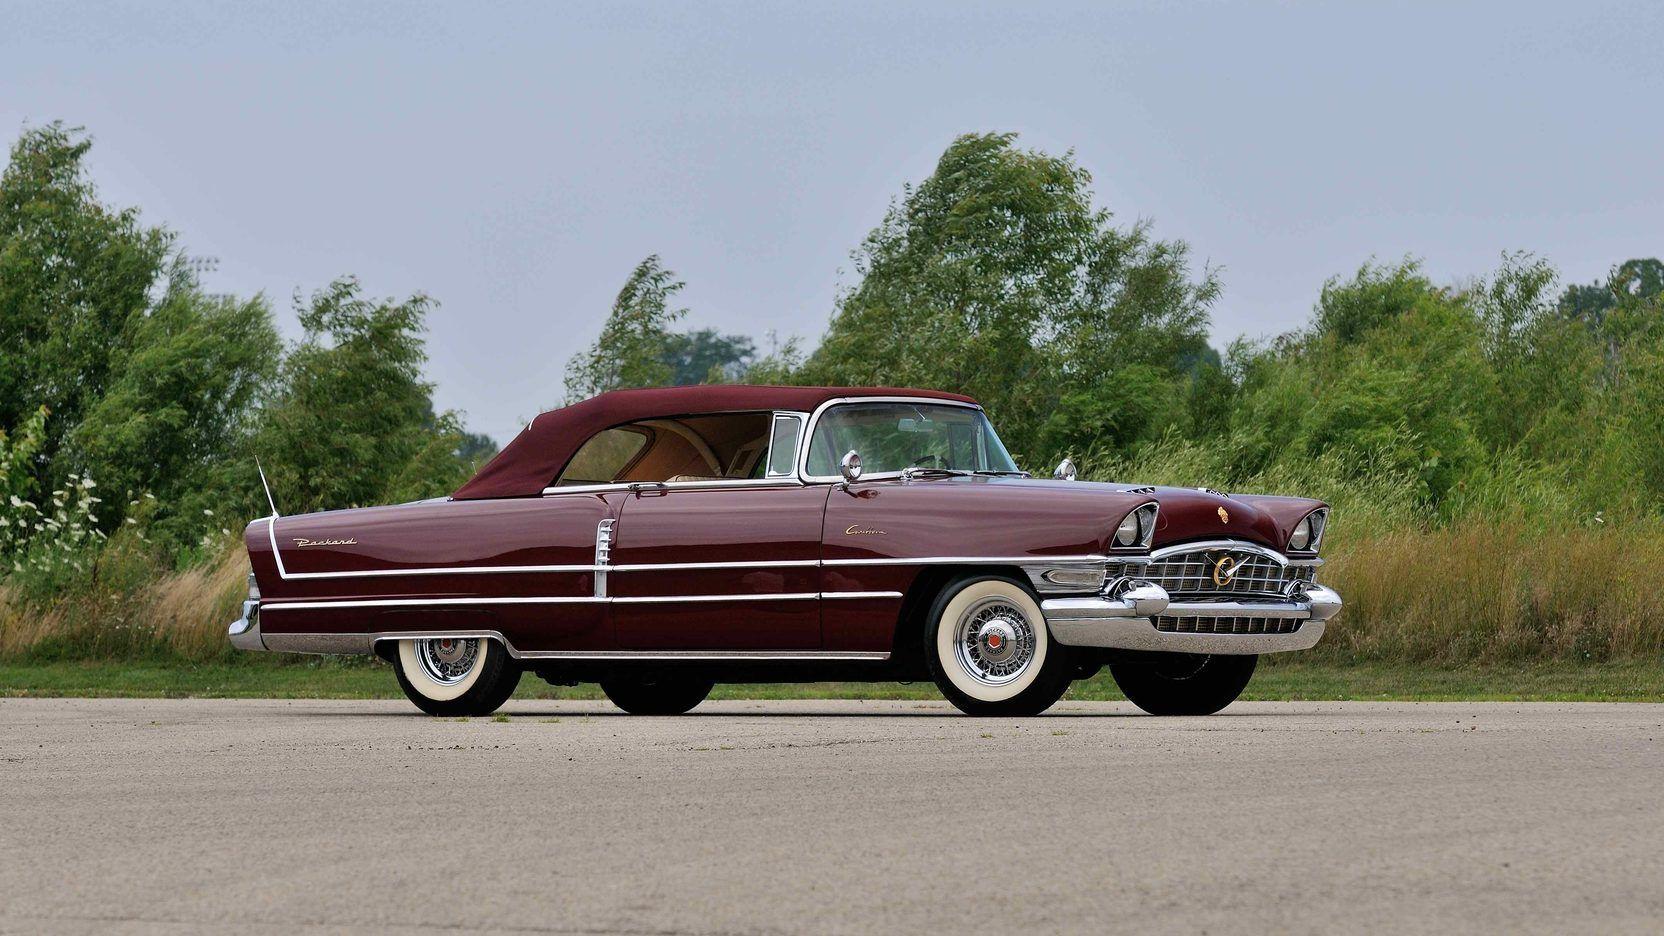 1956 Packard Caribbean Convertible presented as Lot S52.1 at ...